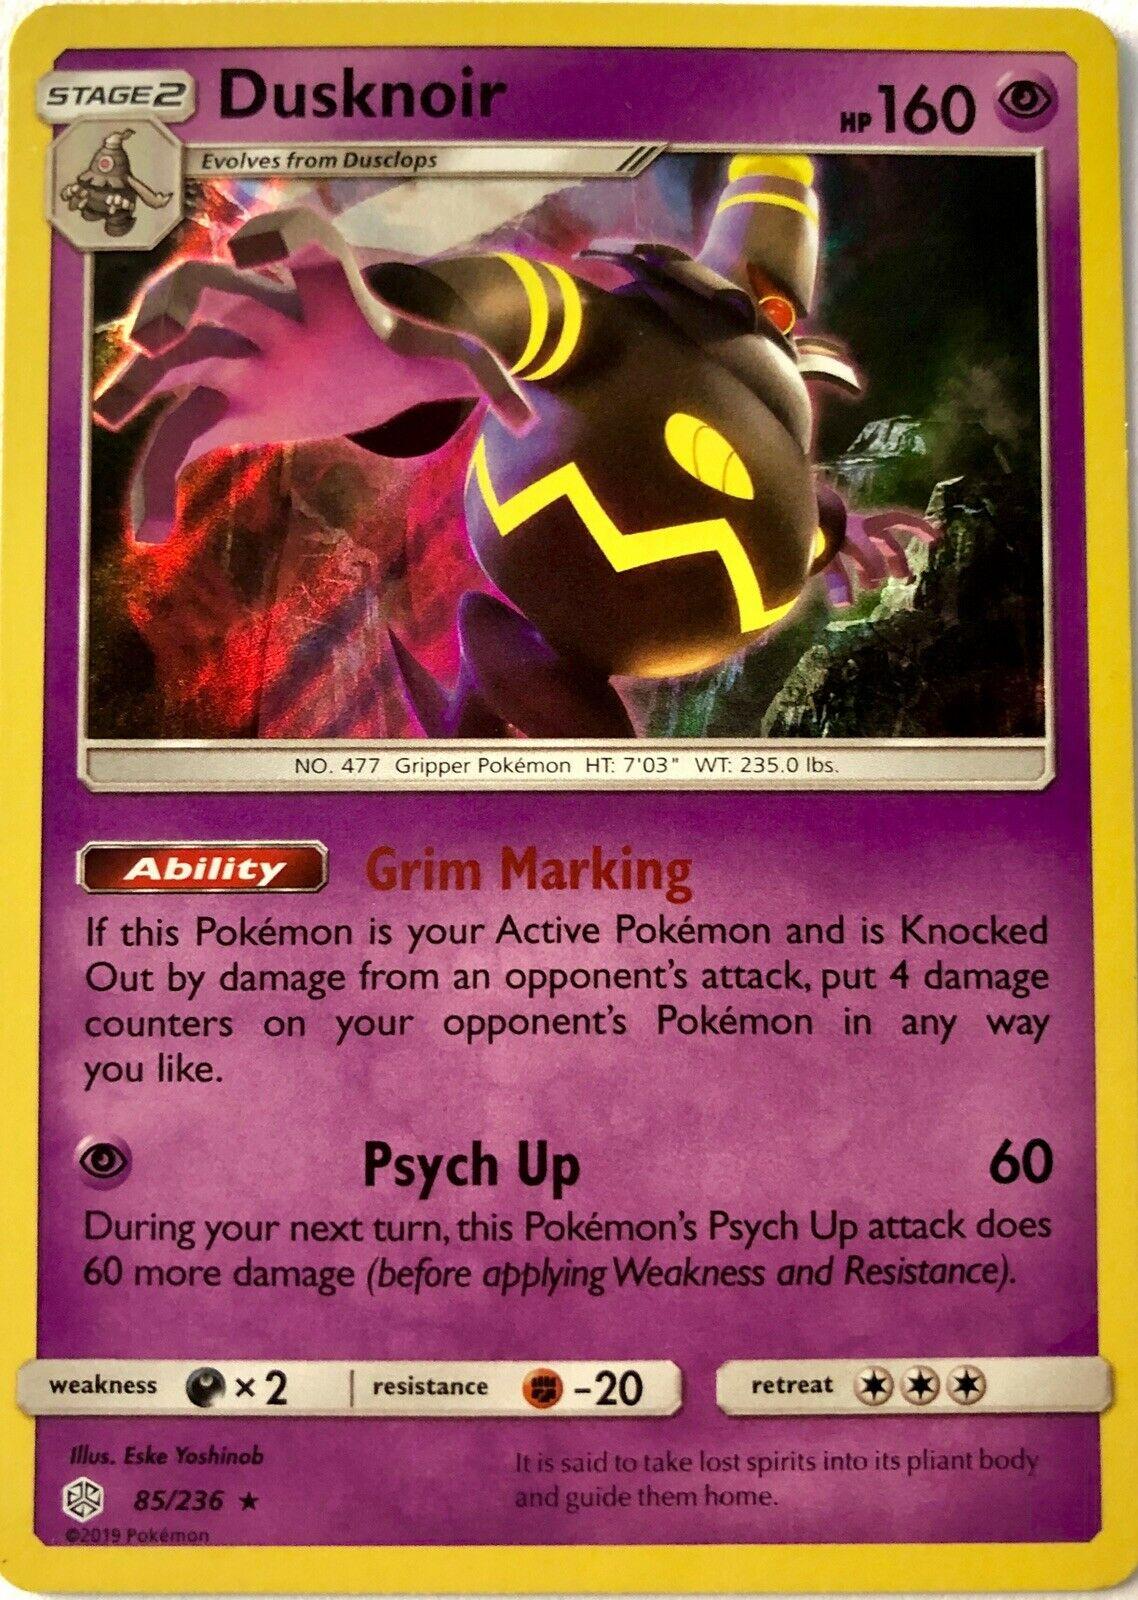 Dusknoir 85/236 Rare Holo, S&M Cosmic Eclipse Pokémon Card - Image 2